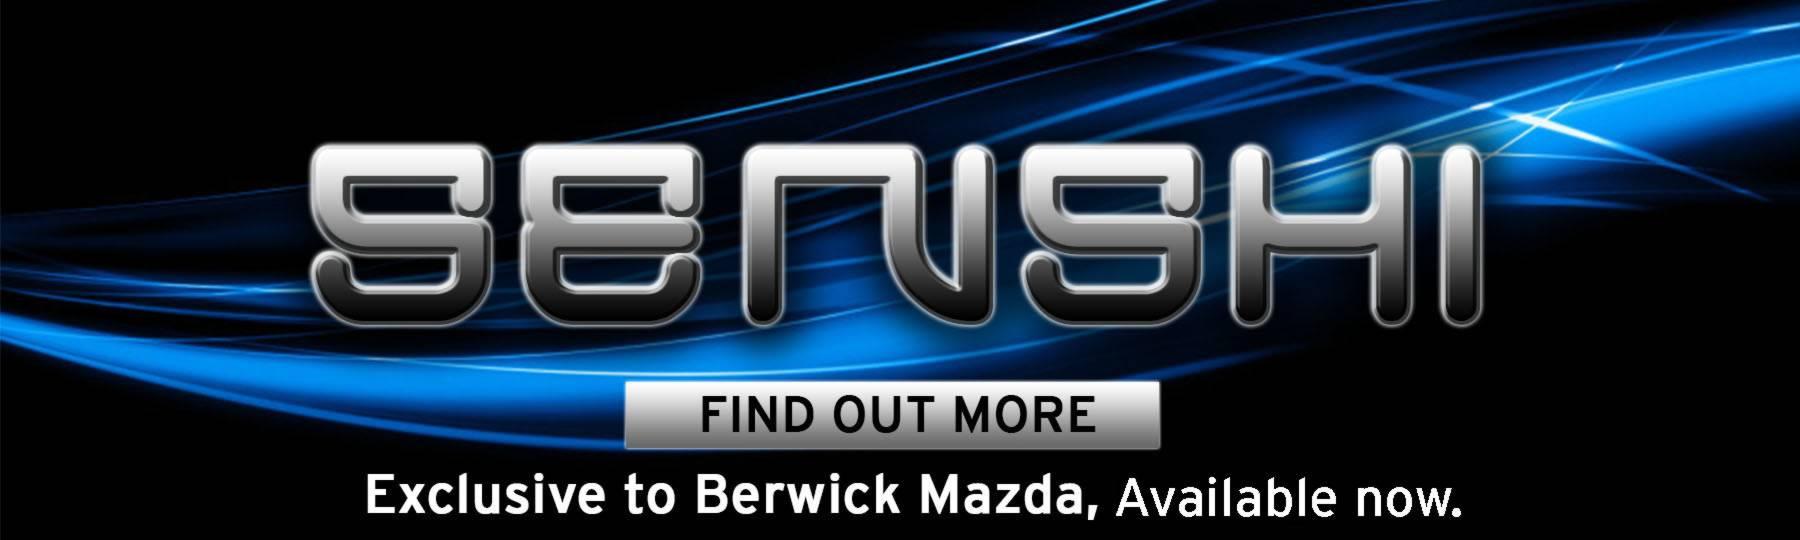 Berwick Mazda- SENSHI